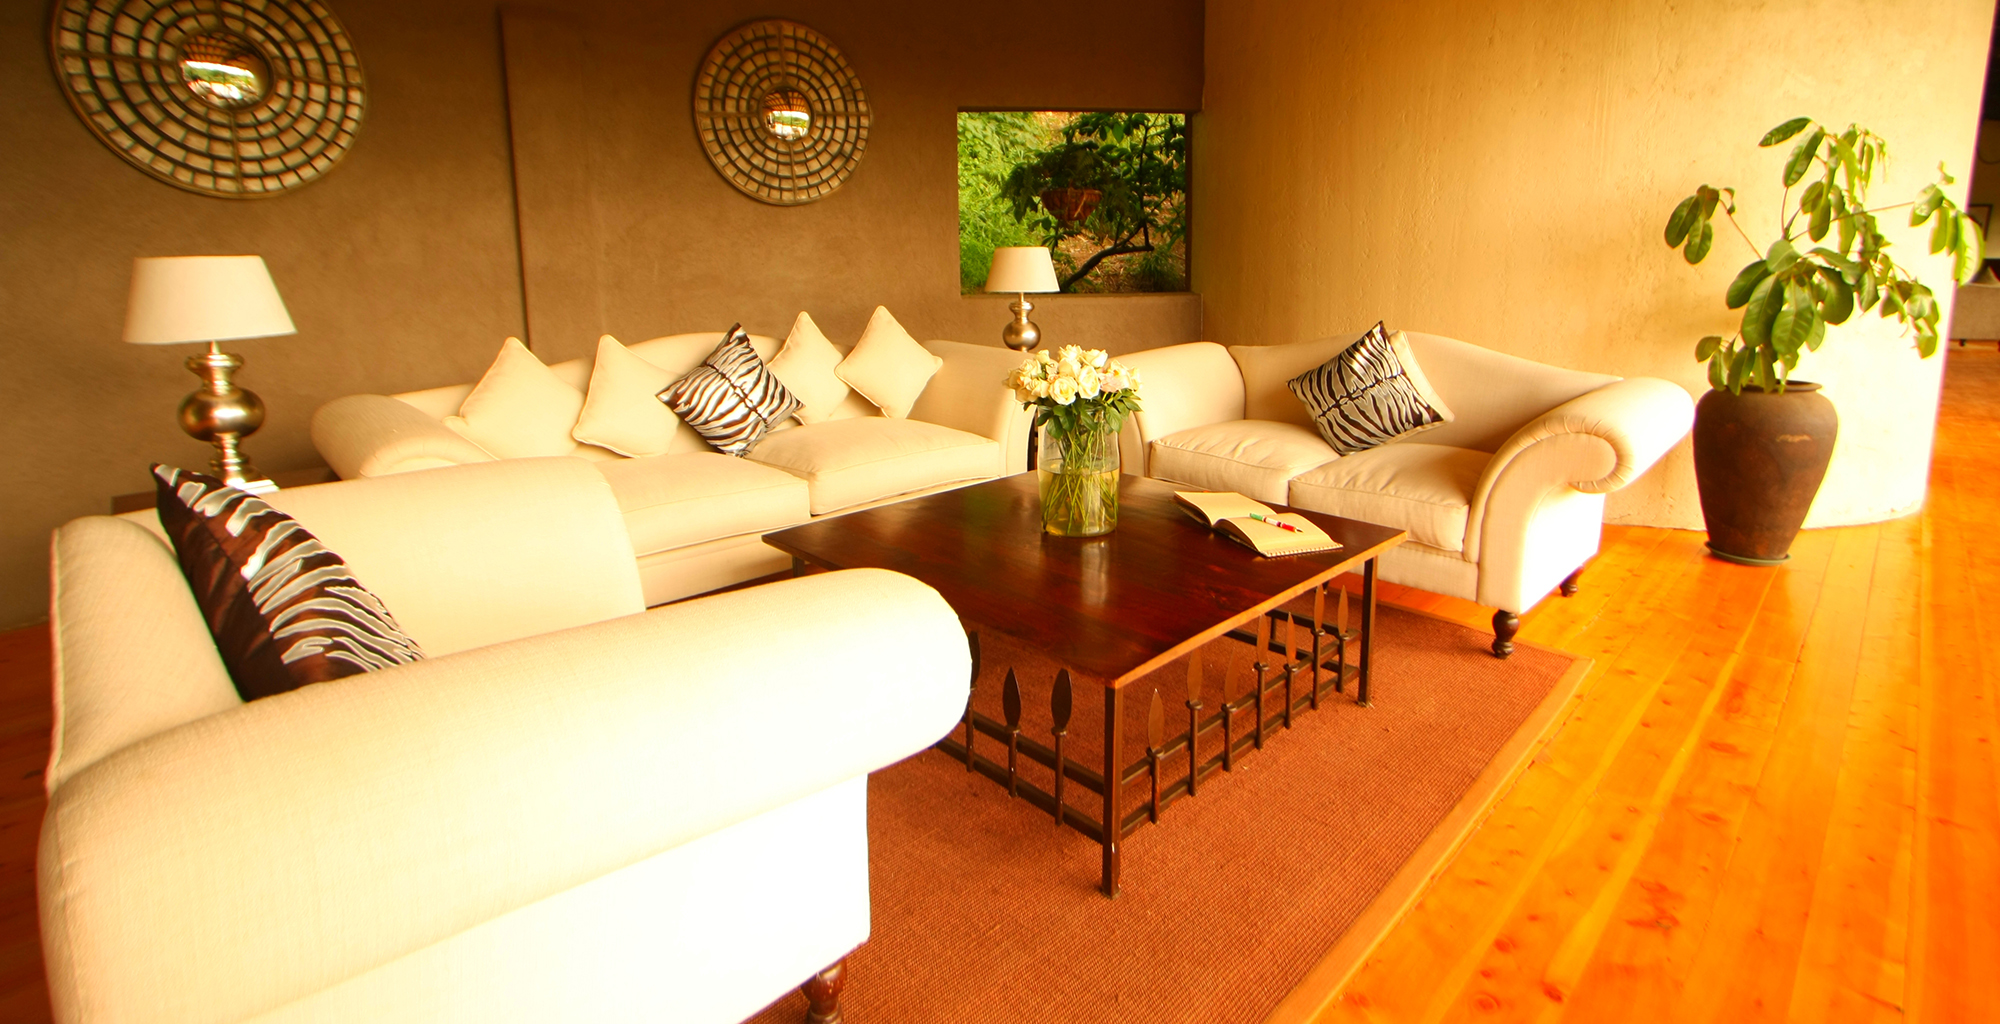 Kenya-Emakoko-Living-Room